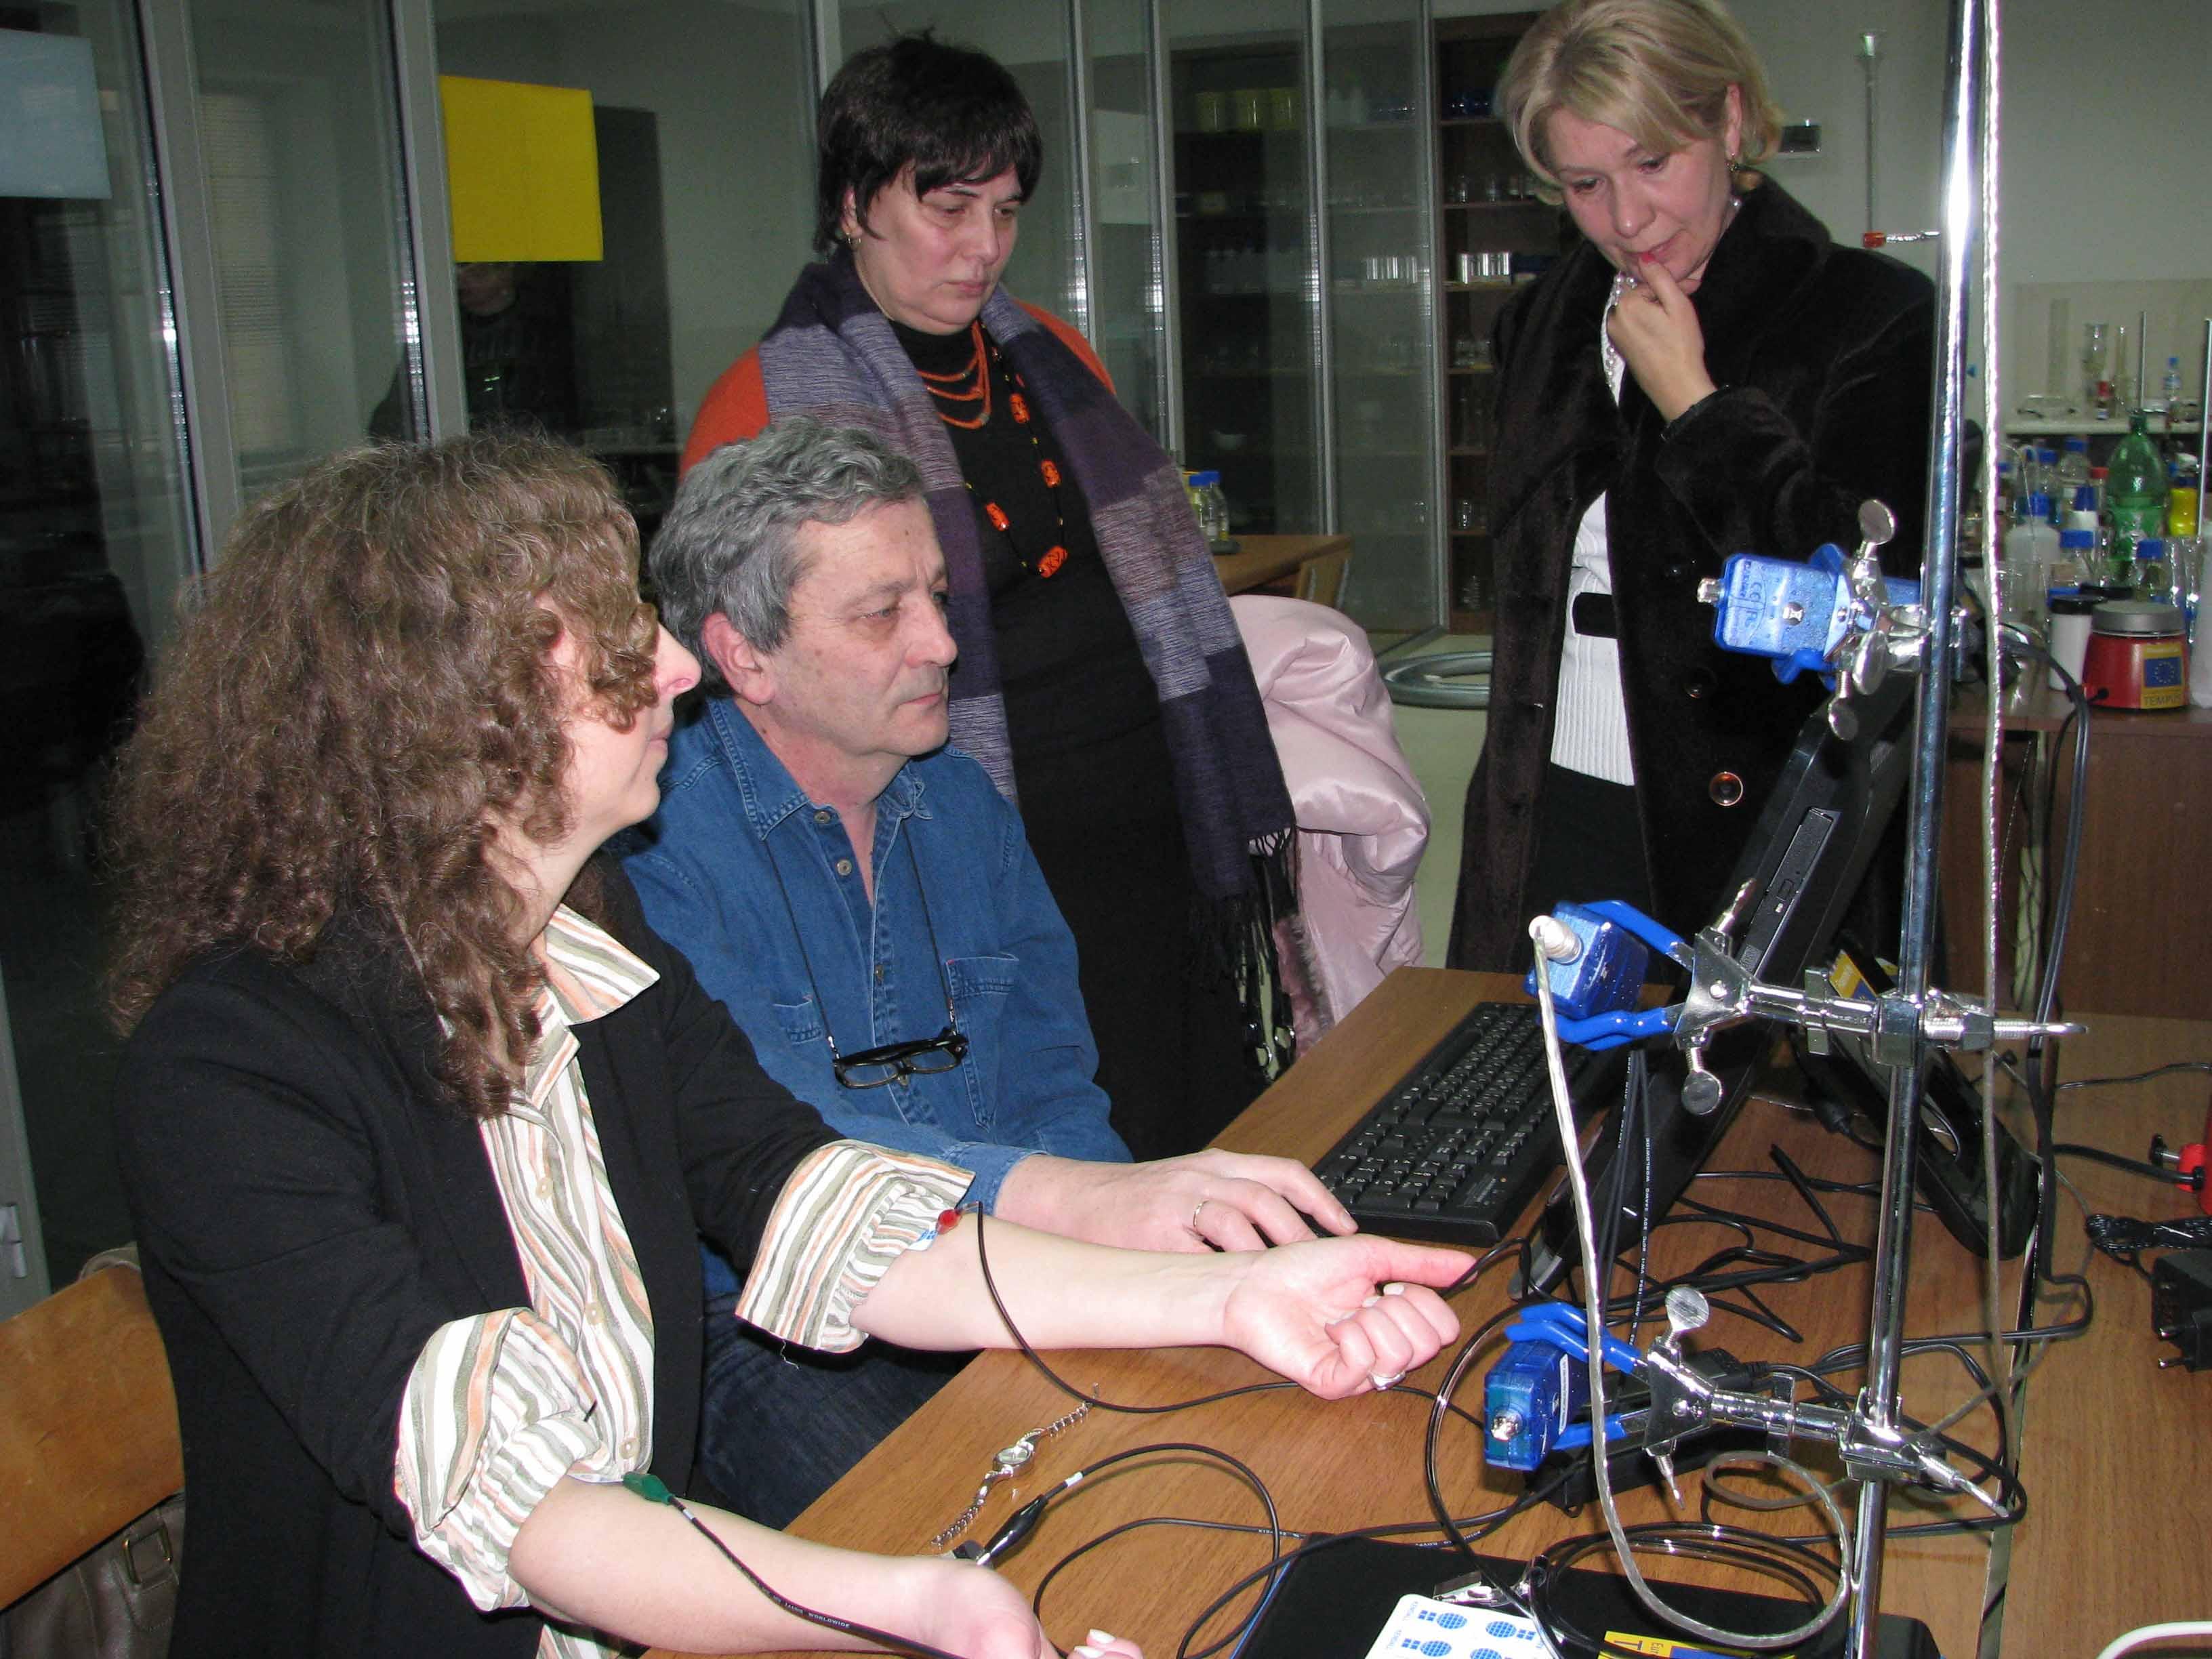 "<a href='http://salis.iliauni.edu.ge/salis-laboratoriis-gakhsna/"">SALiS ლაბორატორიის გახსნა - 1 მარტი, 2012 წელი </a>"